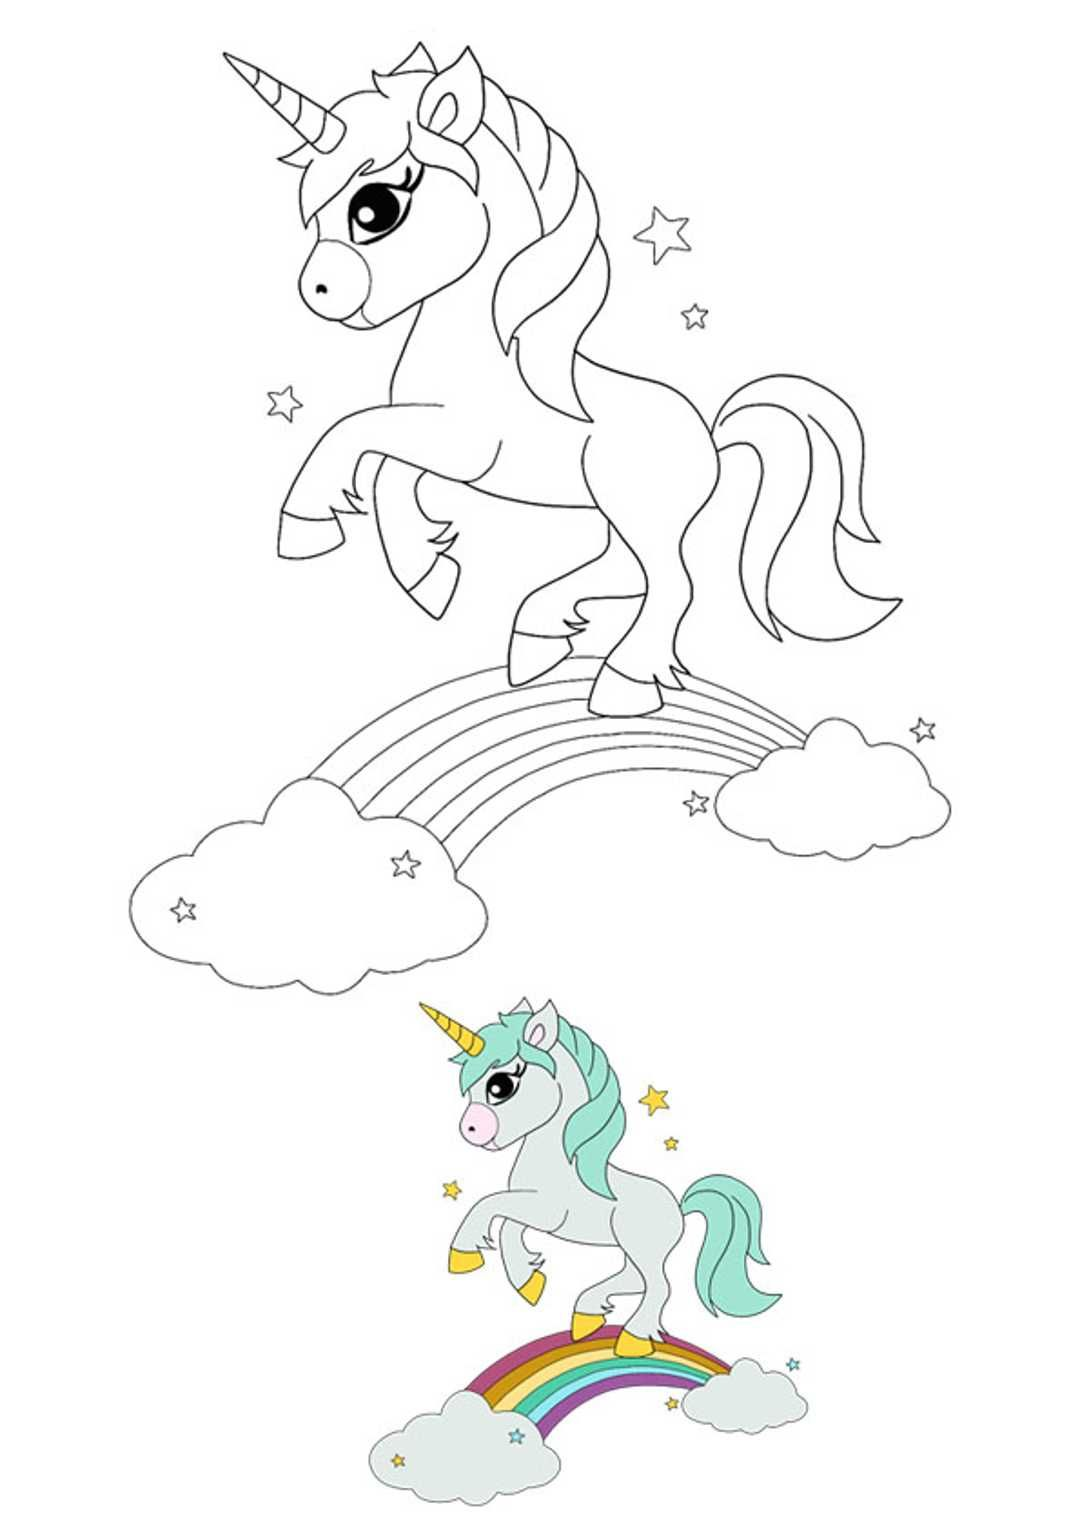 Unicorn Rainbow Coloring Pages Unicorn Coloring Pages My Little Pony Coloring Dog Coloring Page [ 1528 x 1080 Pixel ]